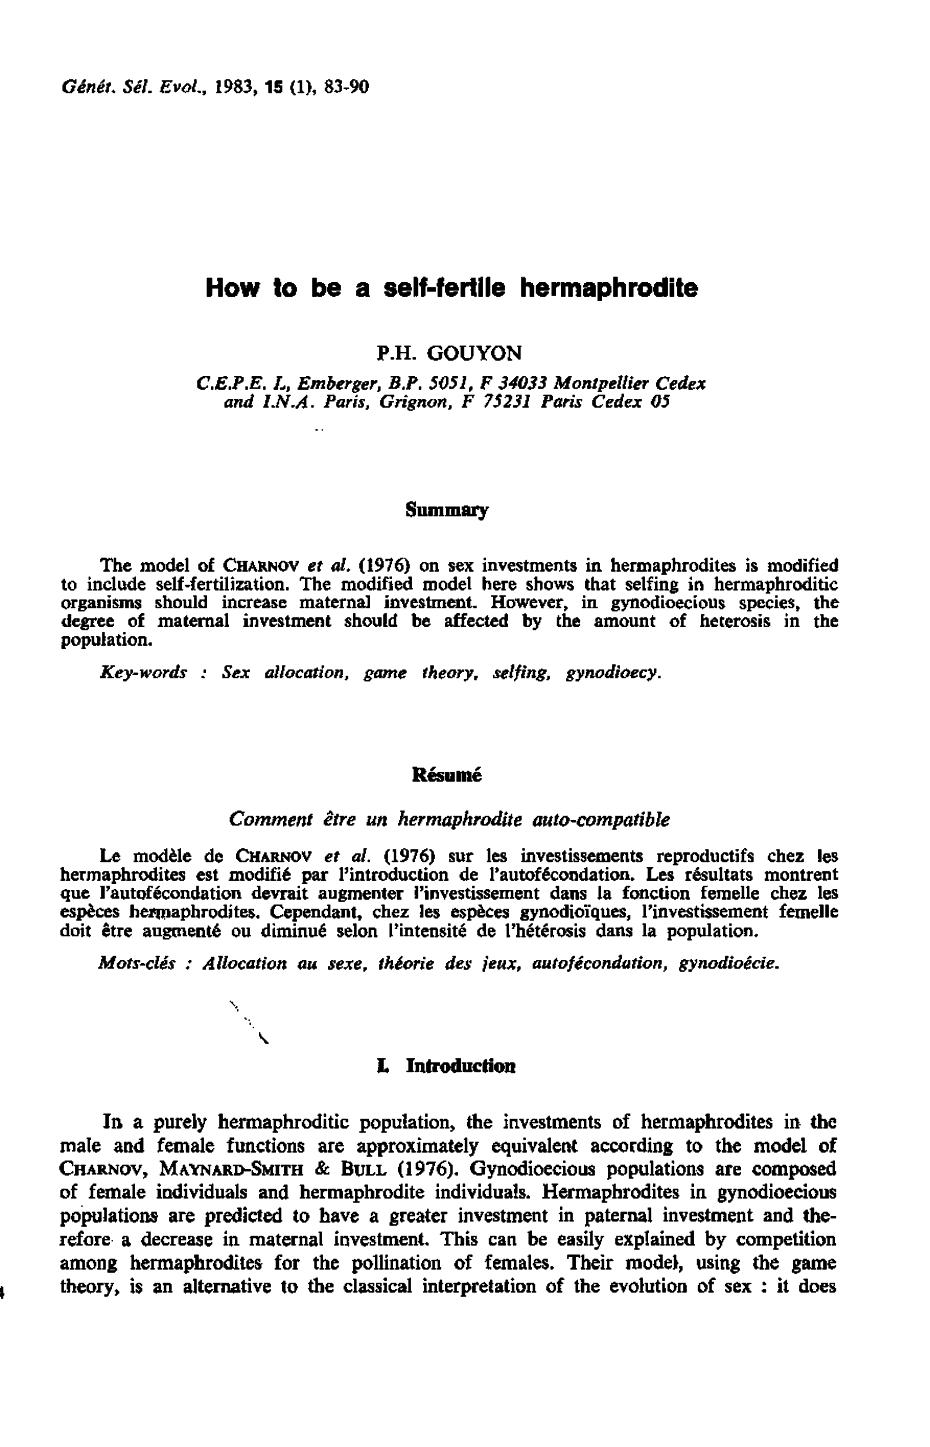 How To Be A Self Fertile Hermaphrodite Genetics Selection Evolution